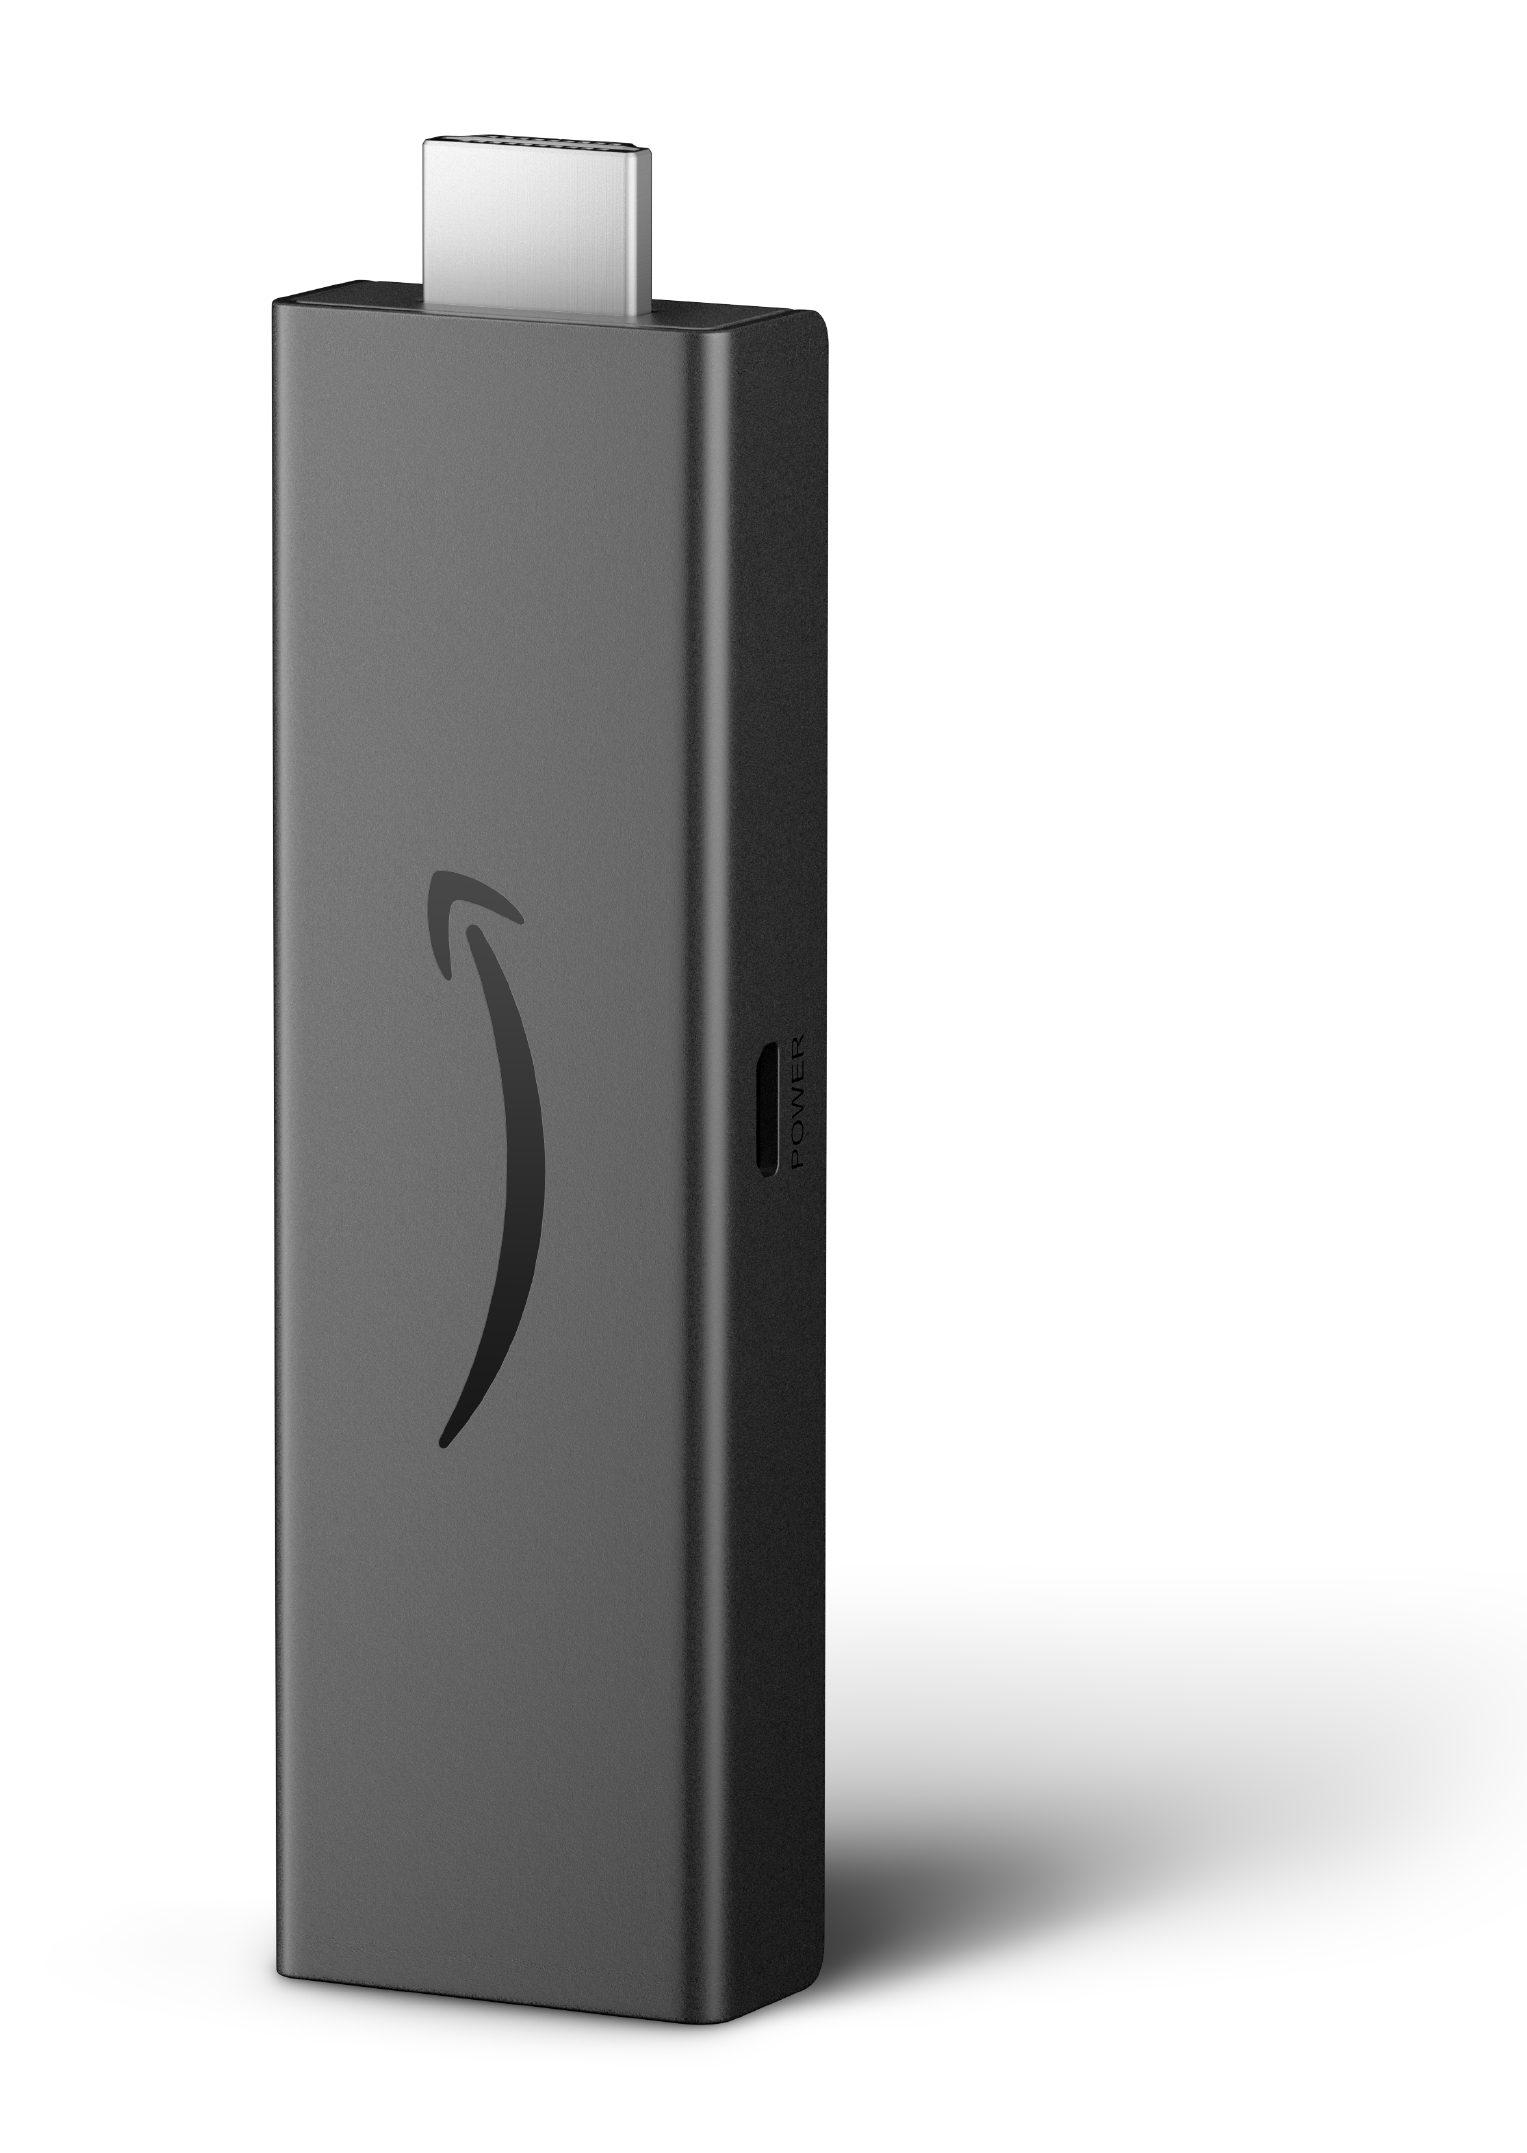 amazon-fire-stick-4k